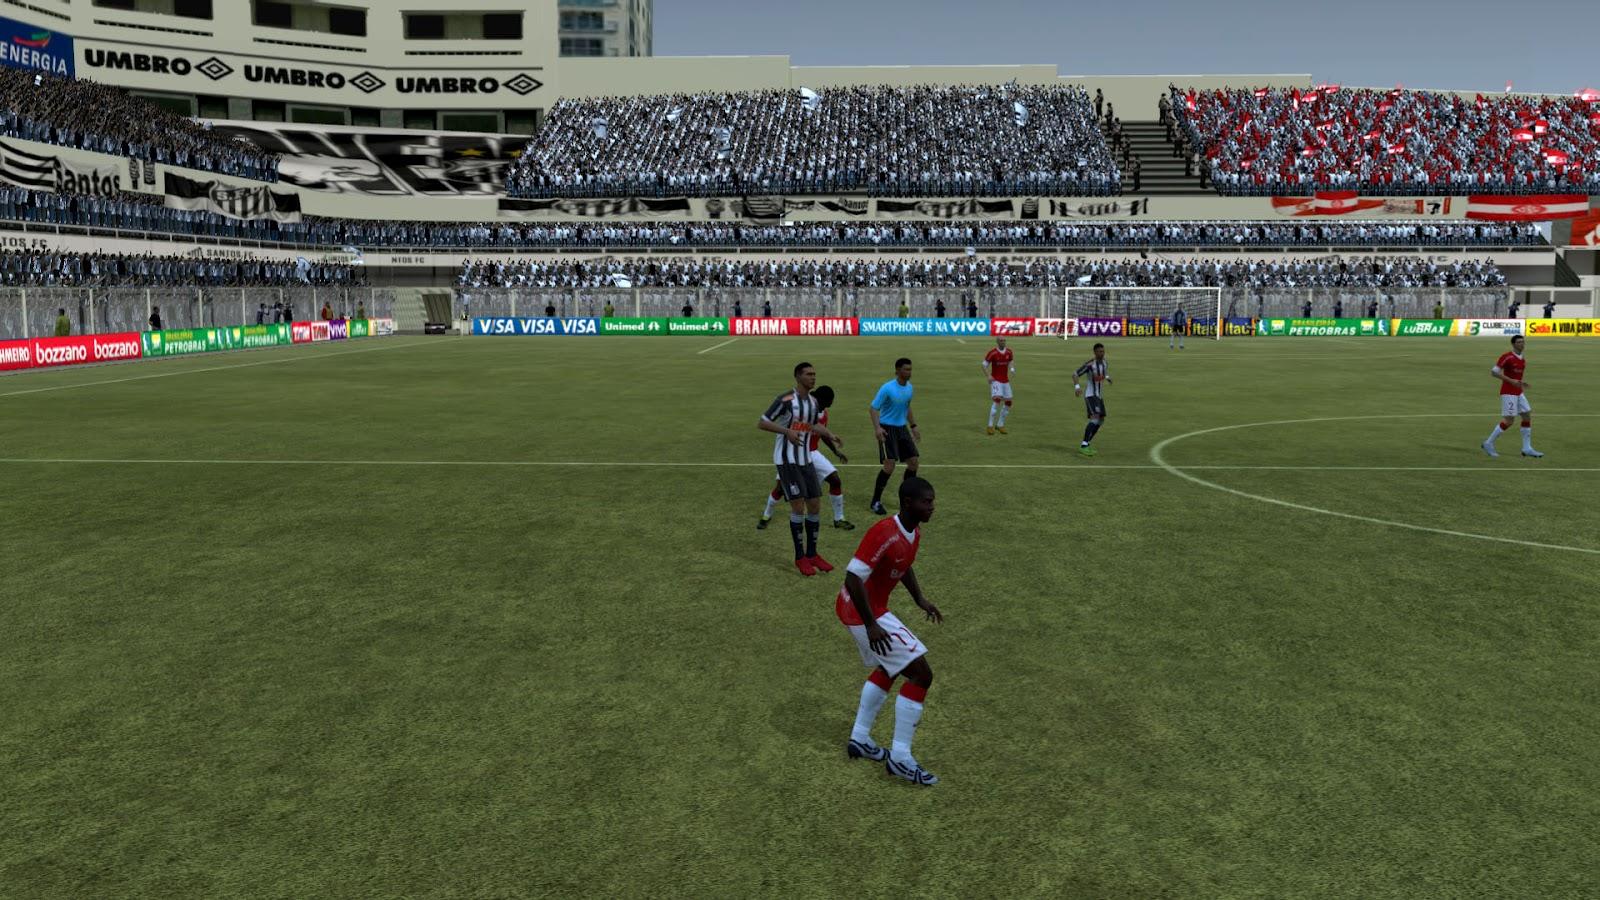 fifa12 vila+belmiro2 FIFA 12: Estádio Vila Belmiro